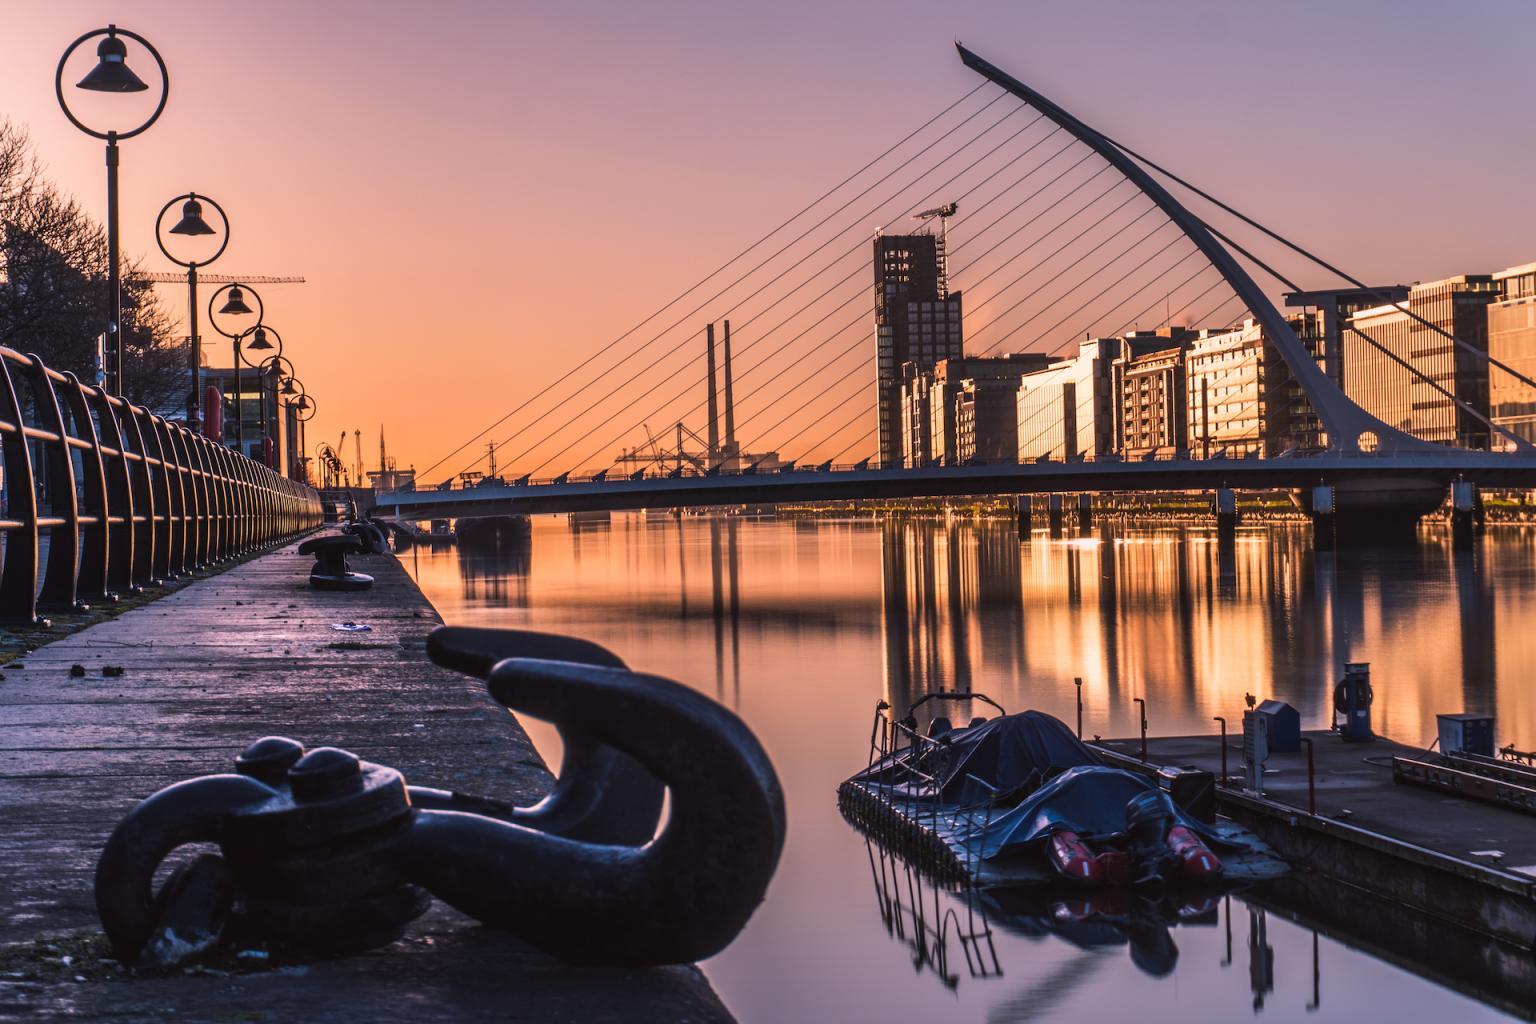 Recuni City Pictures Dublin